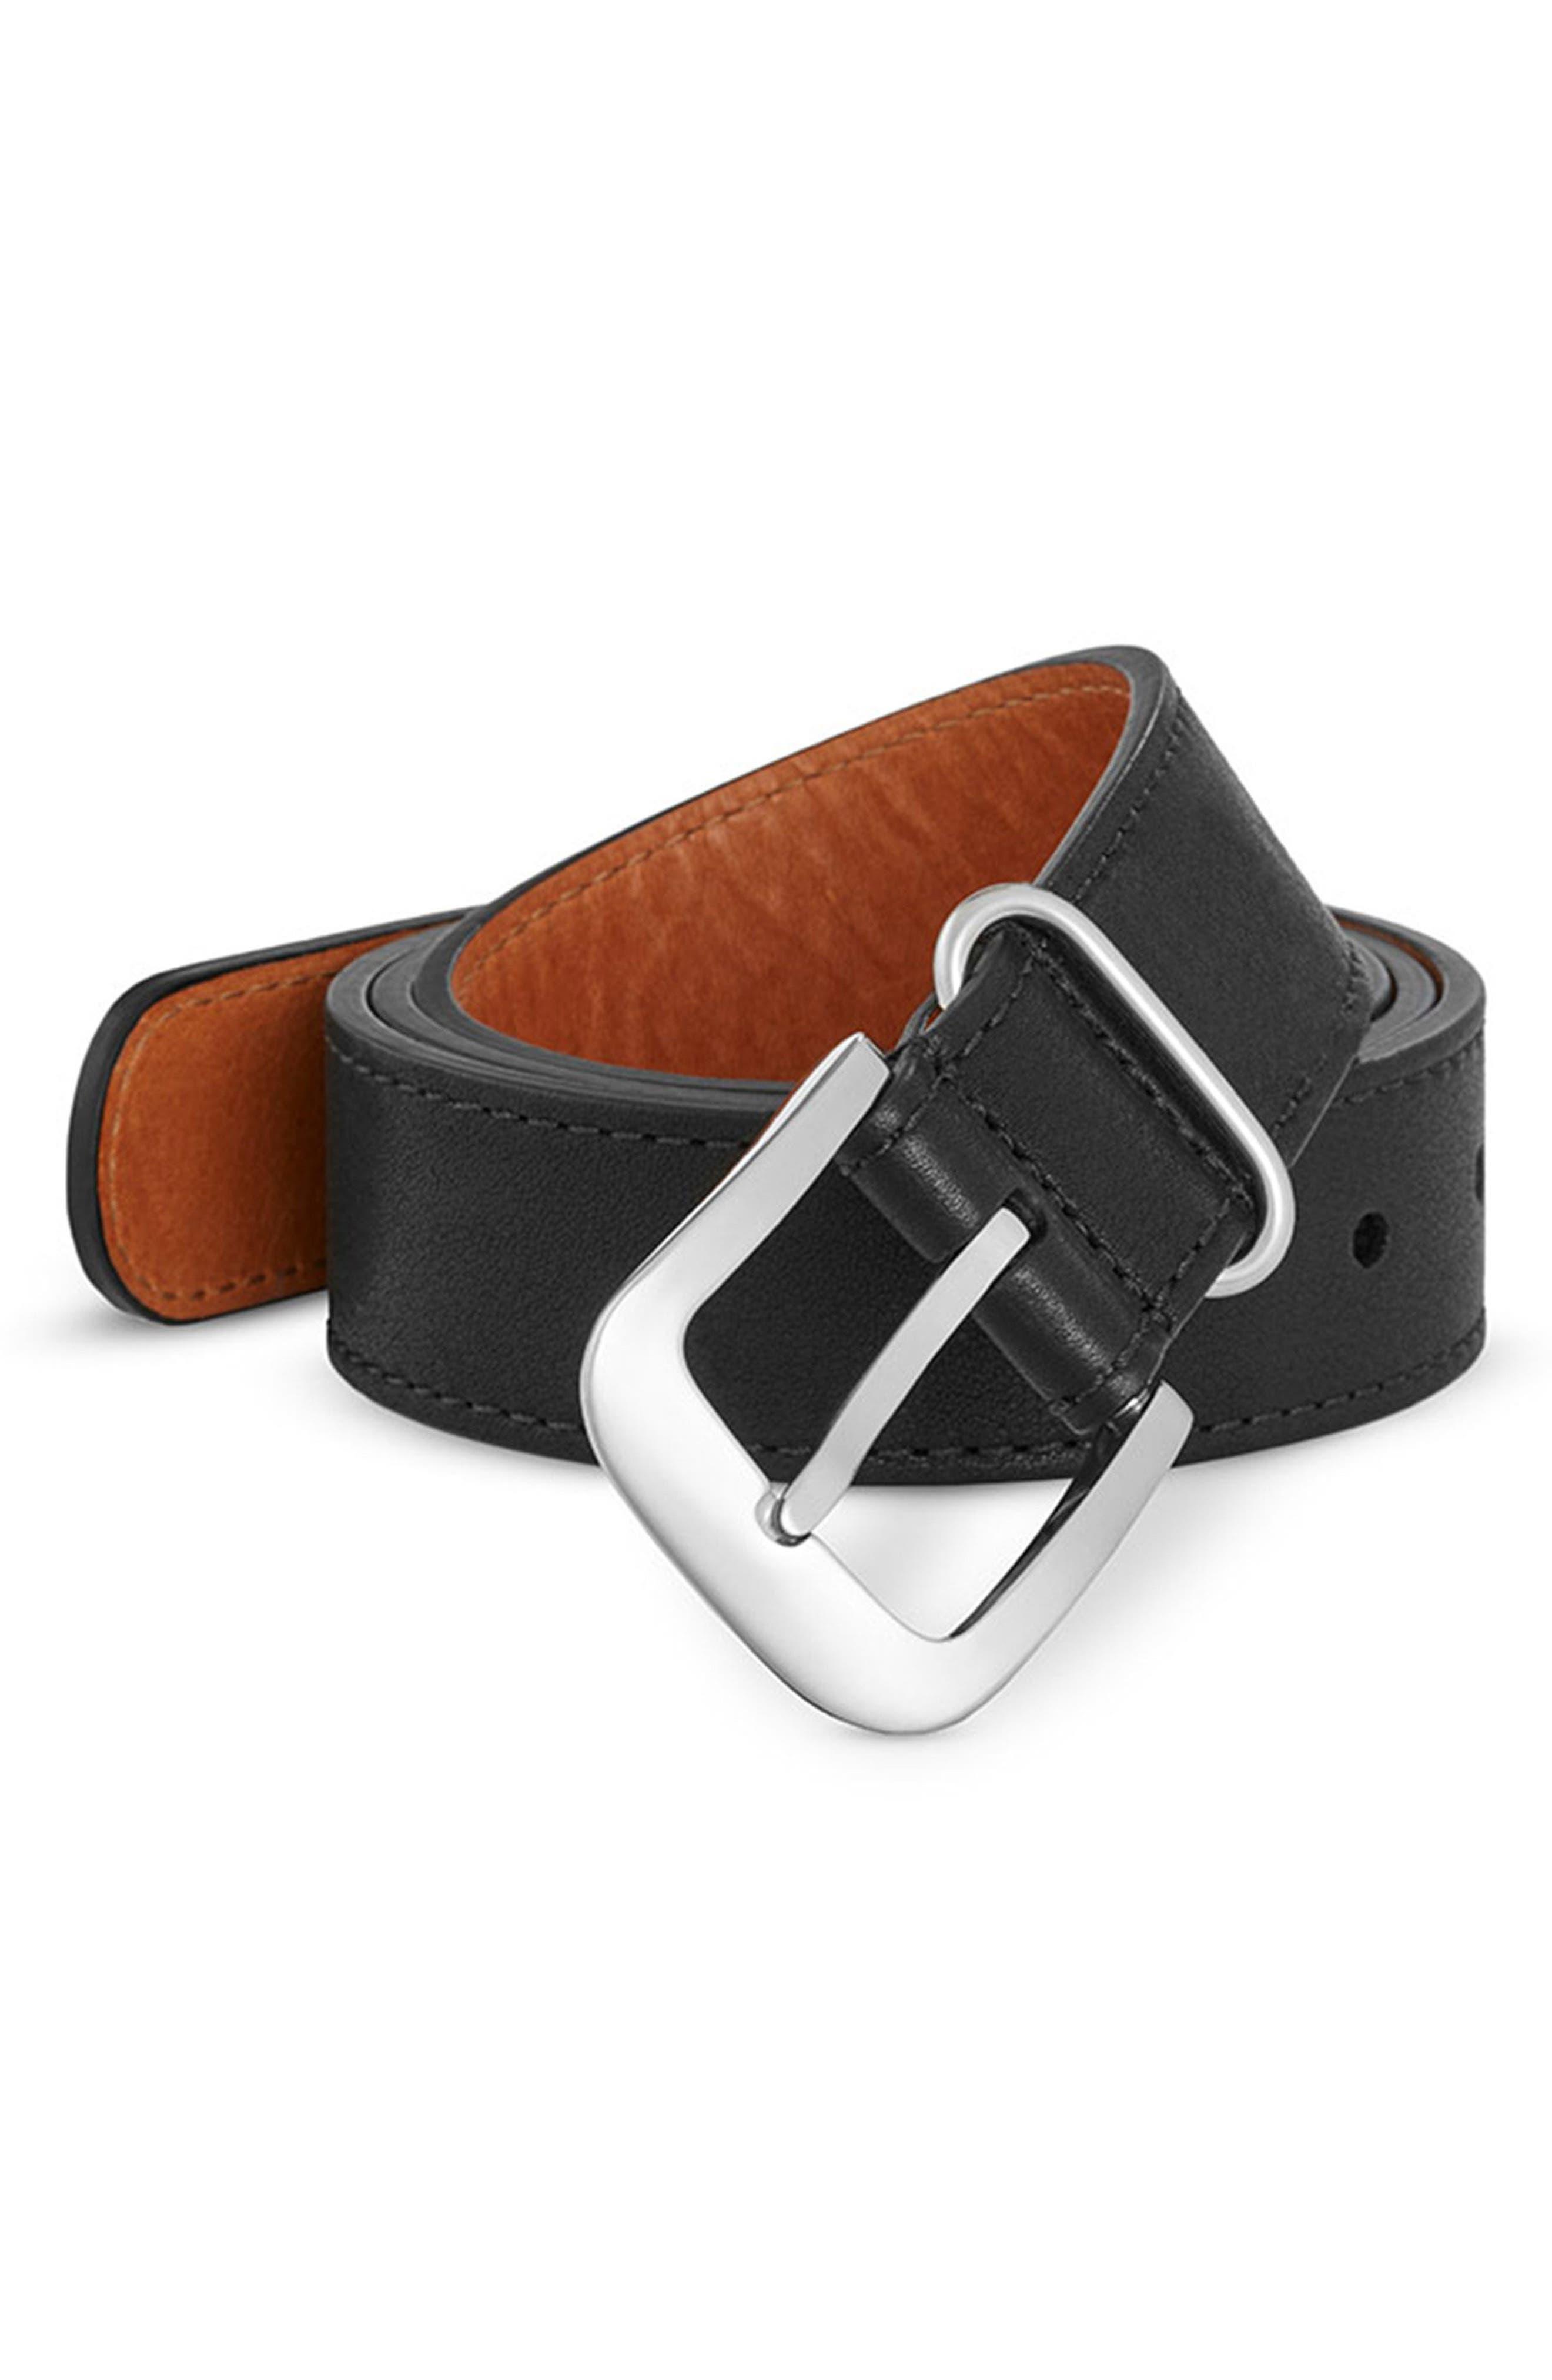 G10 Leather Belt,                             Alternate thumbnail 2, color,                             001